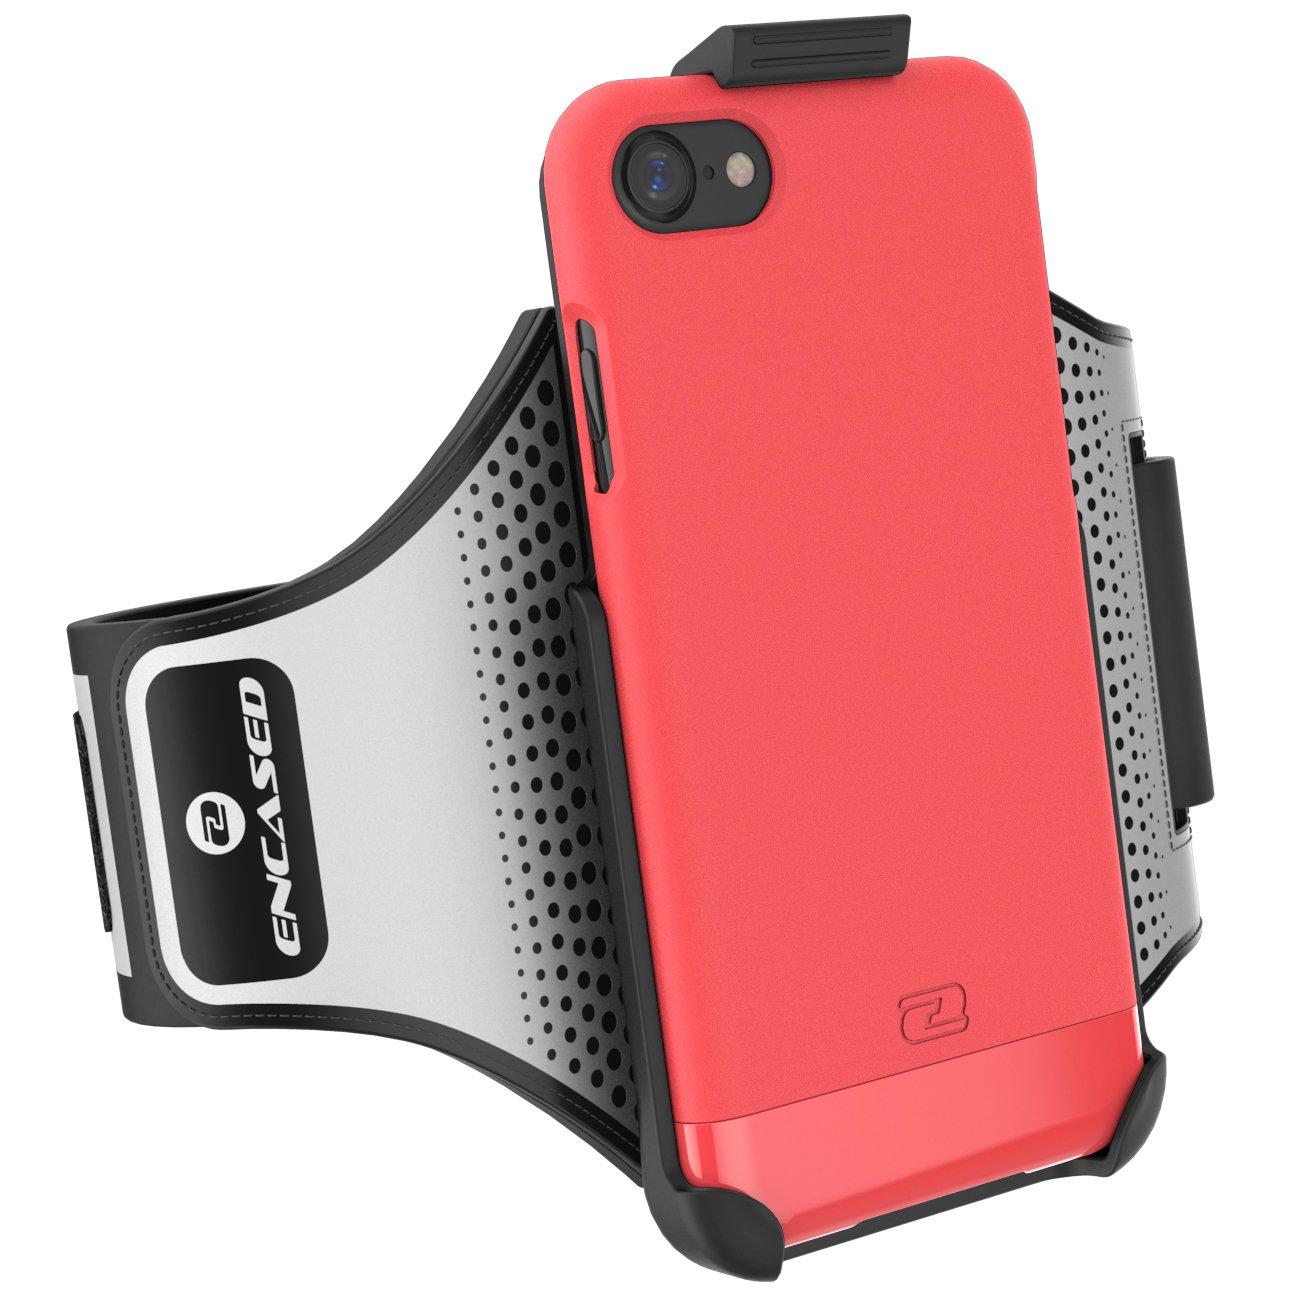 Encased Slimshield iPhone 7 Armband & Sport Case (2 pc Set) Includes Click-N-Go Running Arm Band w/Hybrid Cover (Rose Gold) S-TREK-I7GLD